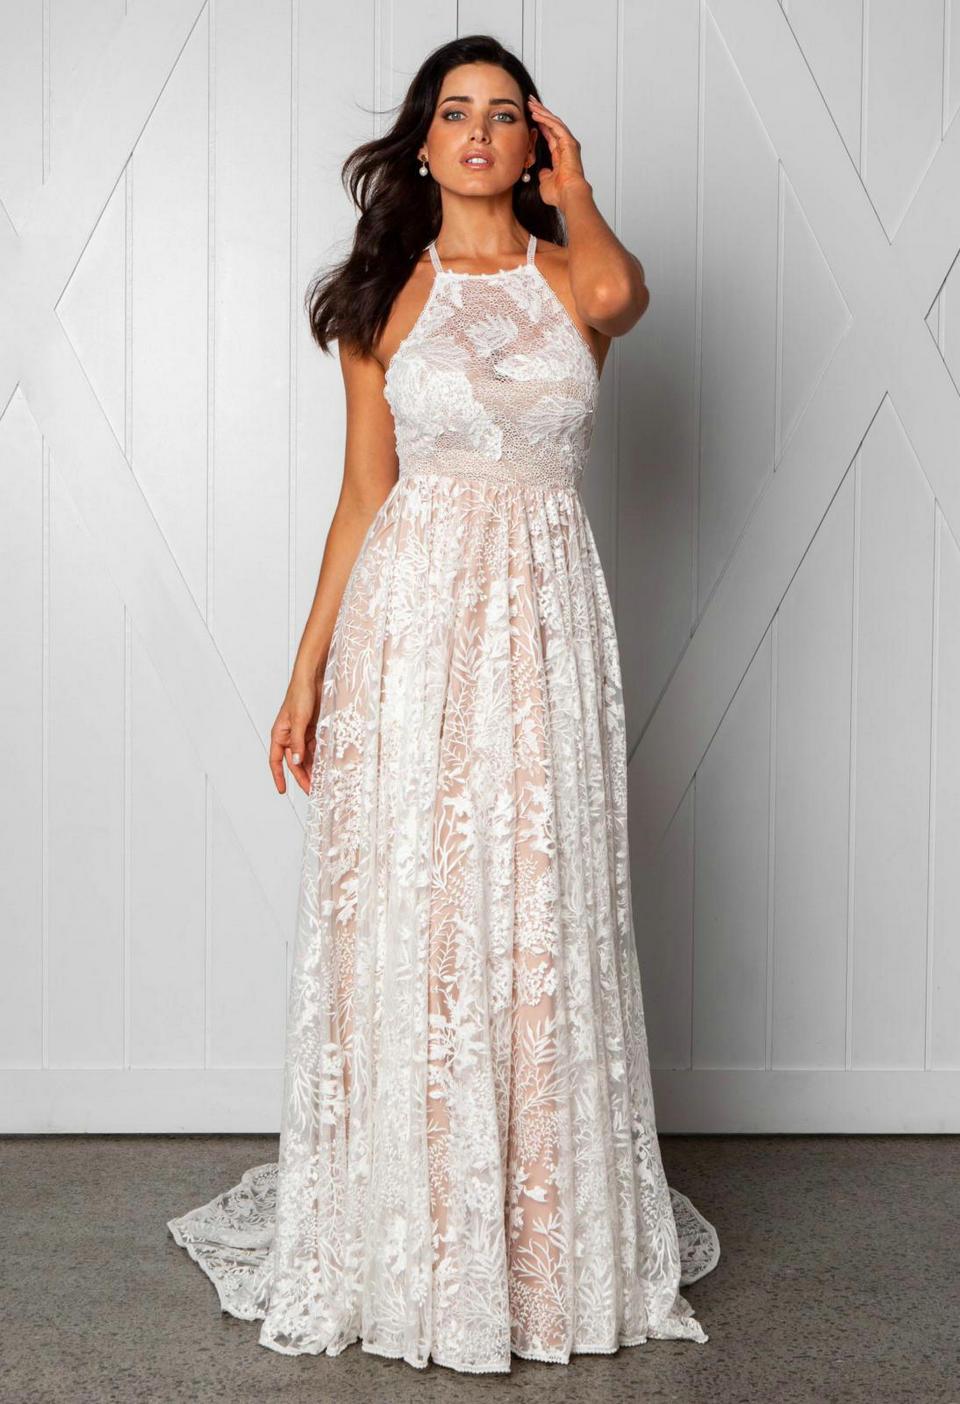 Wedding Attire For Women.Us 43 61 11 Off Luxury Boho Lace Long Wedding Dress 2019 Elegant Wedding Gowns Women Party Bohemian Scoop Backless Beach Rural Bride Dresses New In